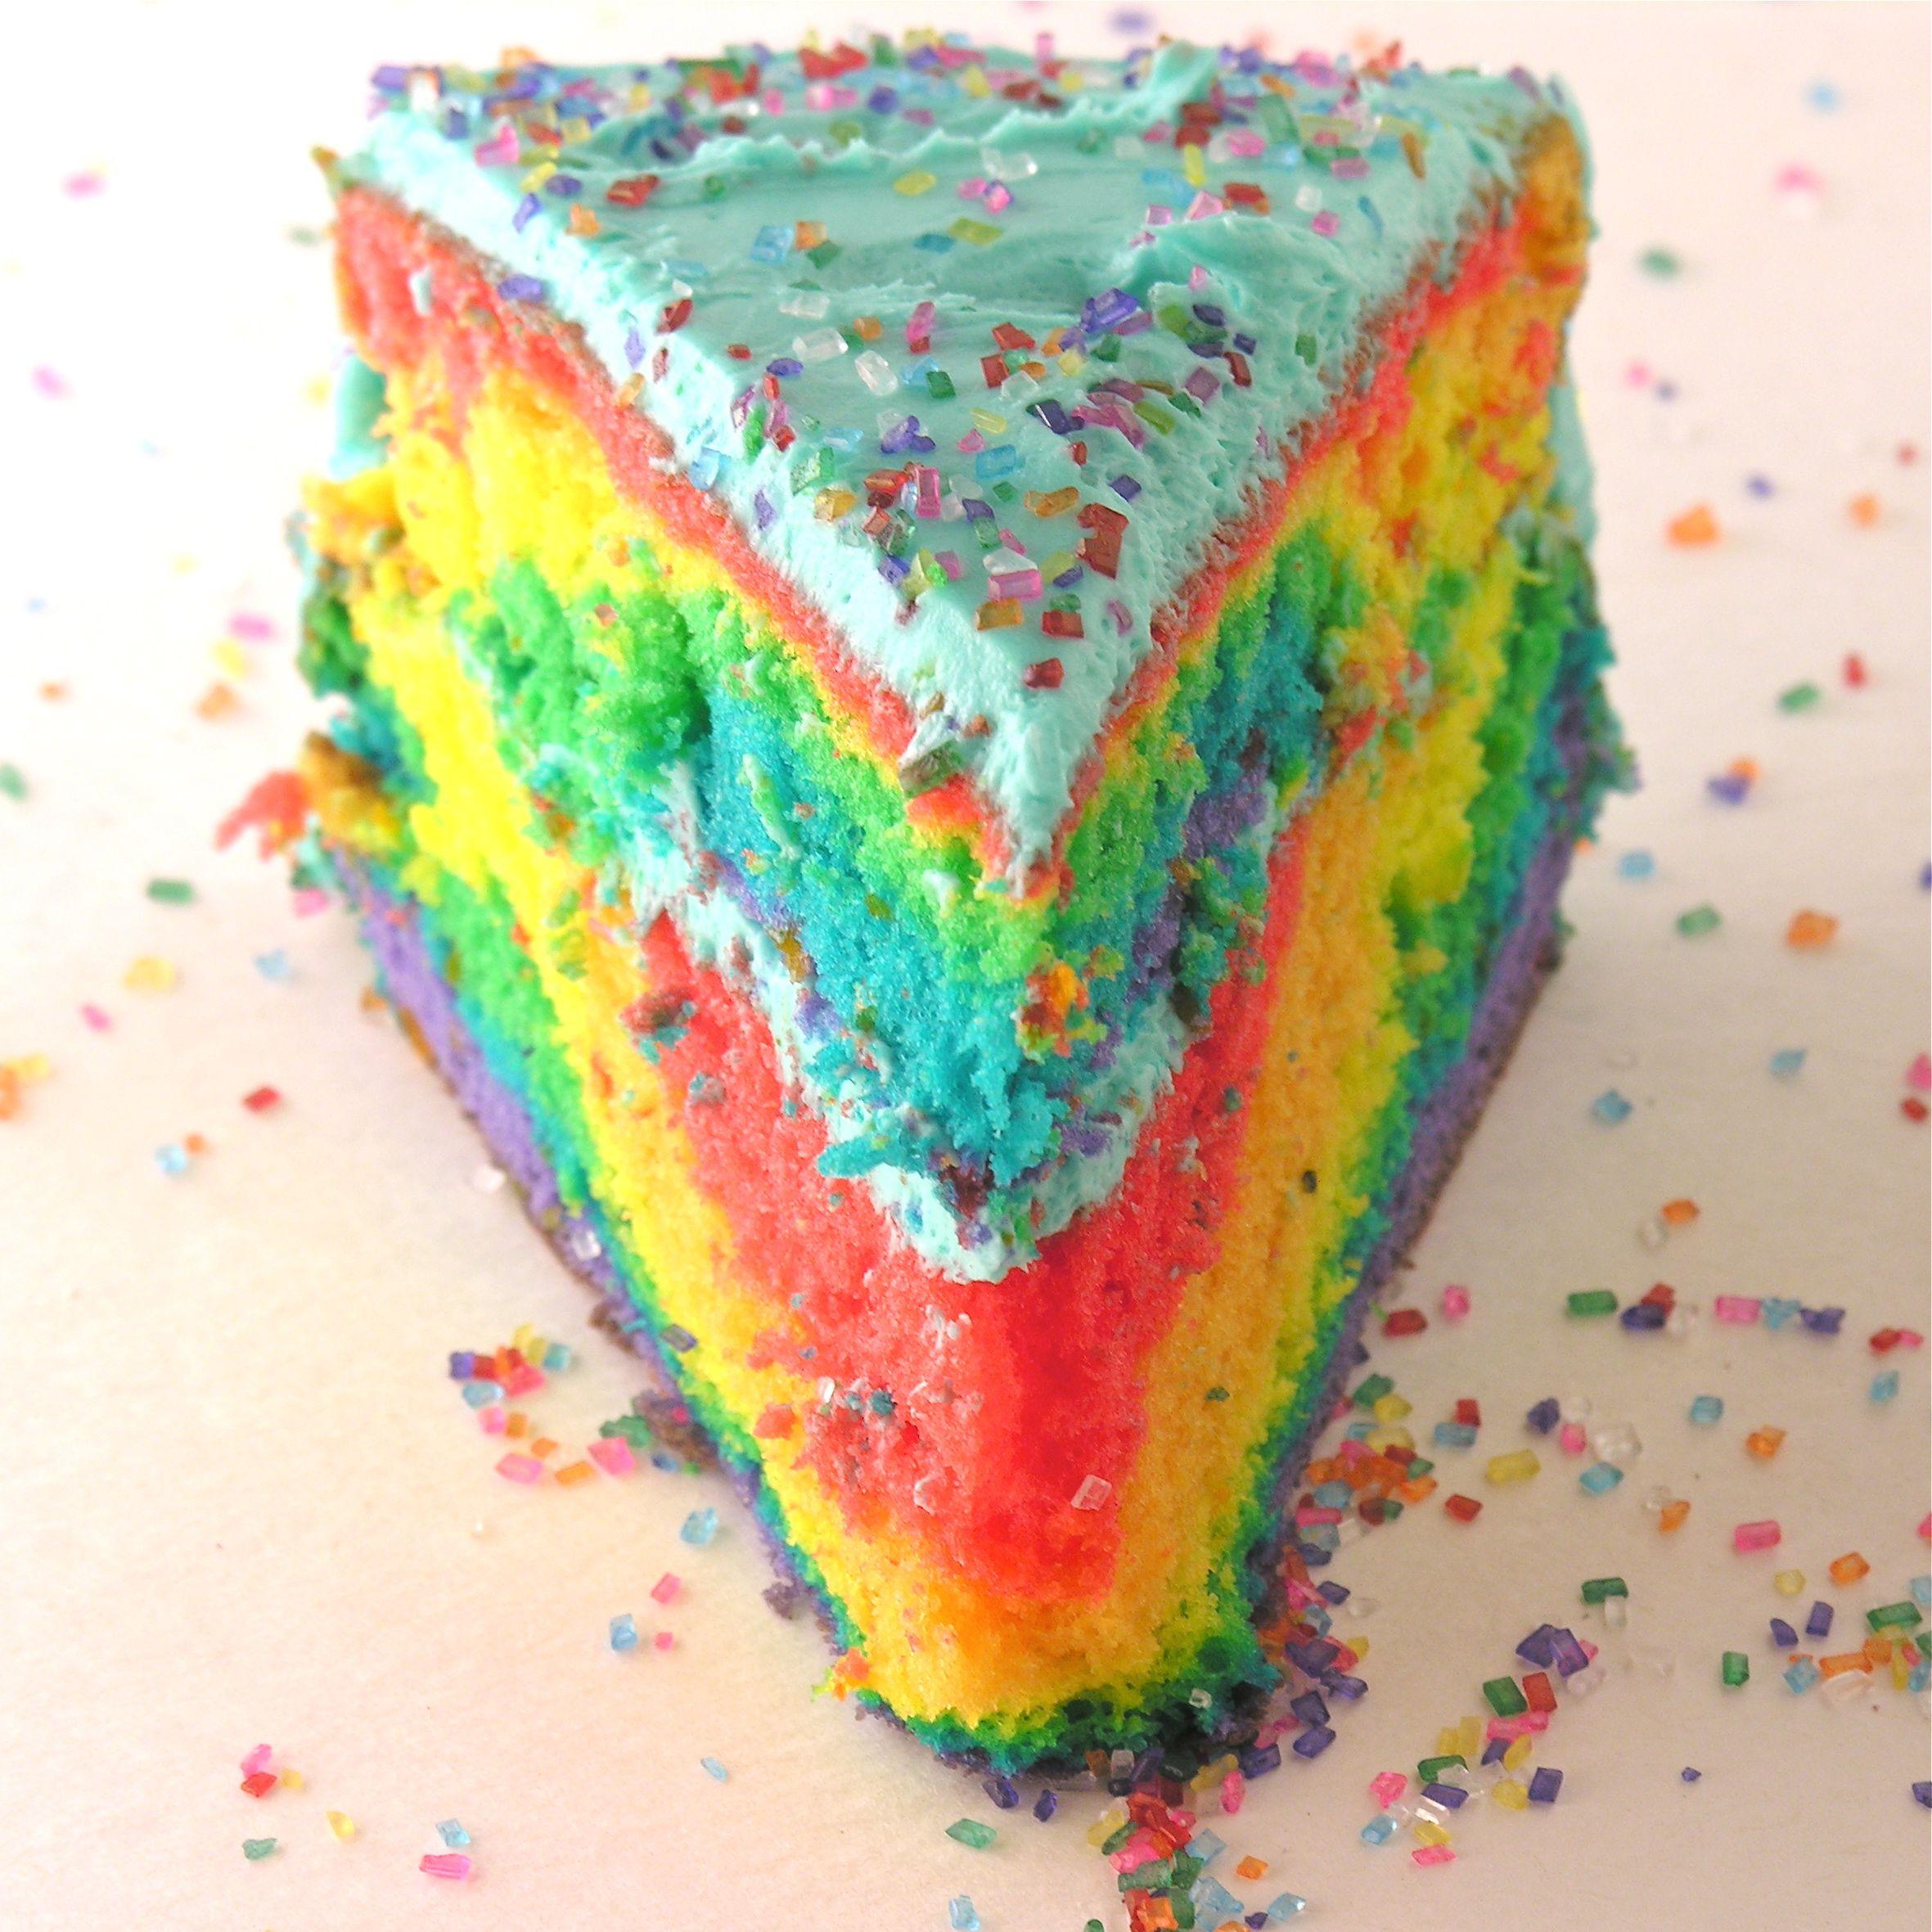 Fun Tie-dye rainbow cake!